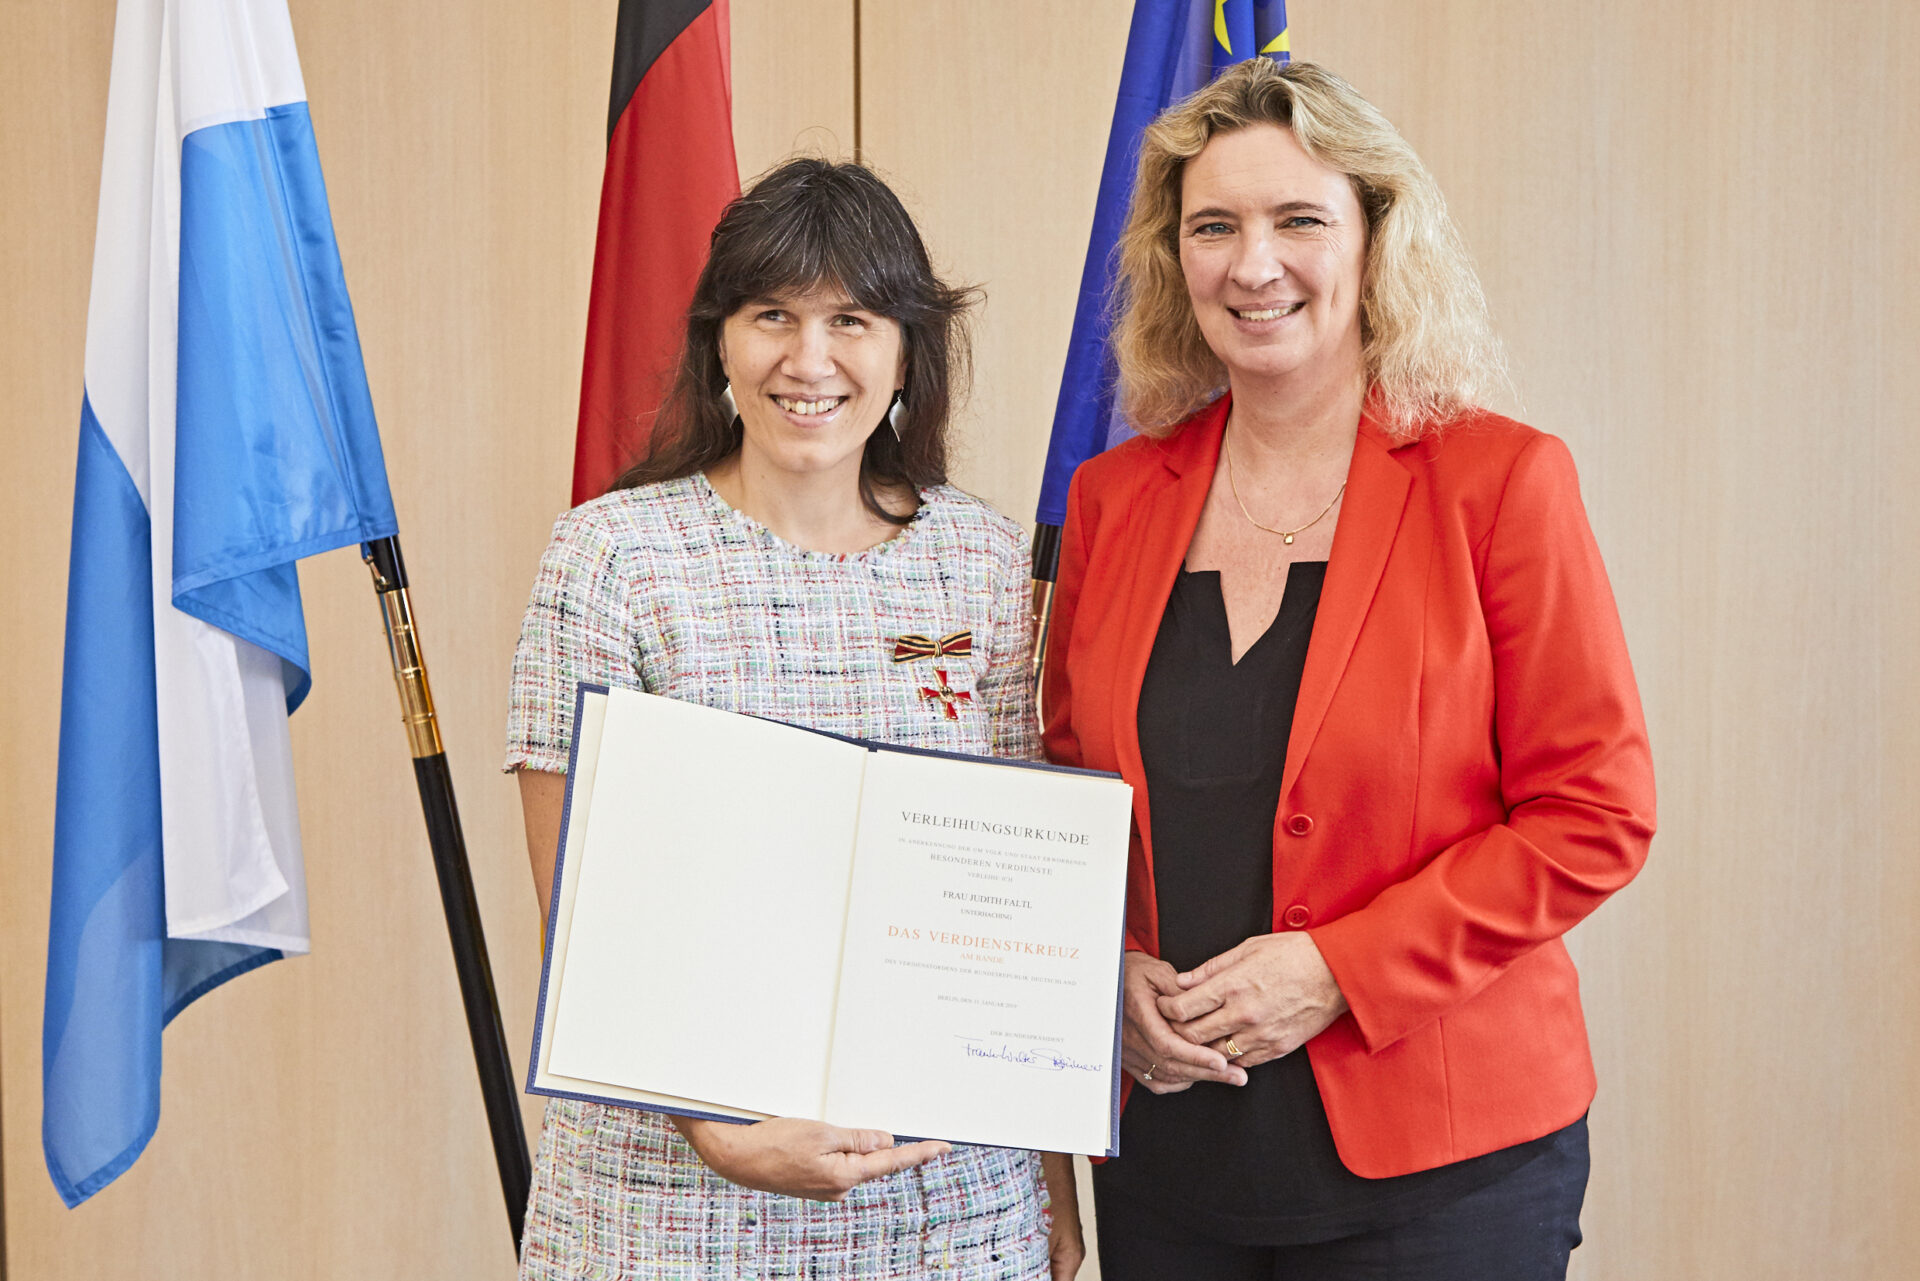 Übergabe Bundesverdienstkreuz Judith Faltl, Kerstin Schreyer